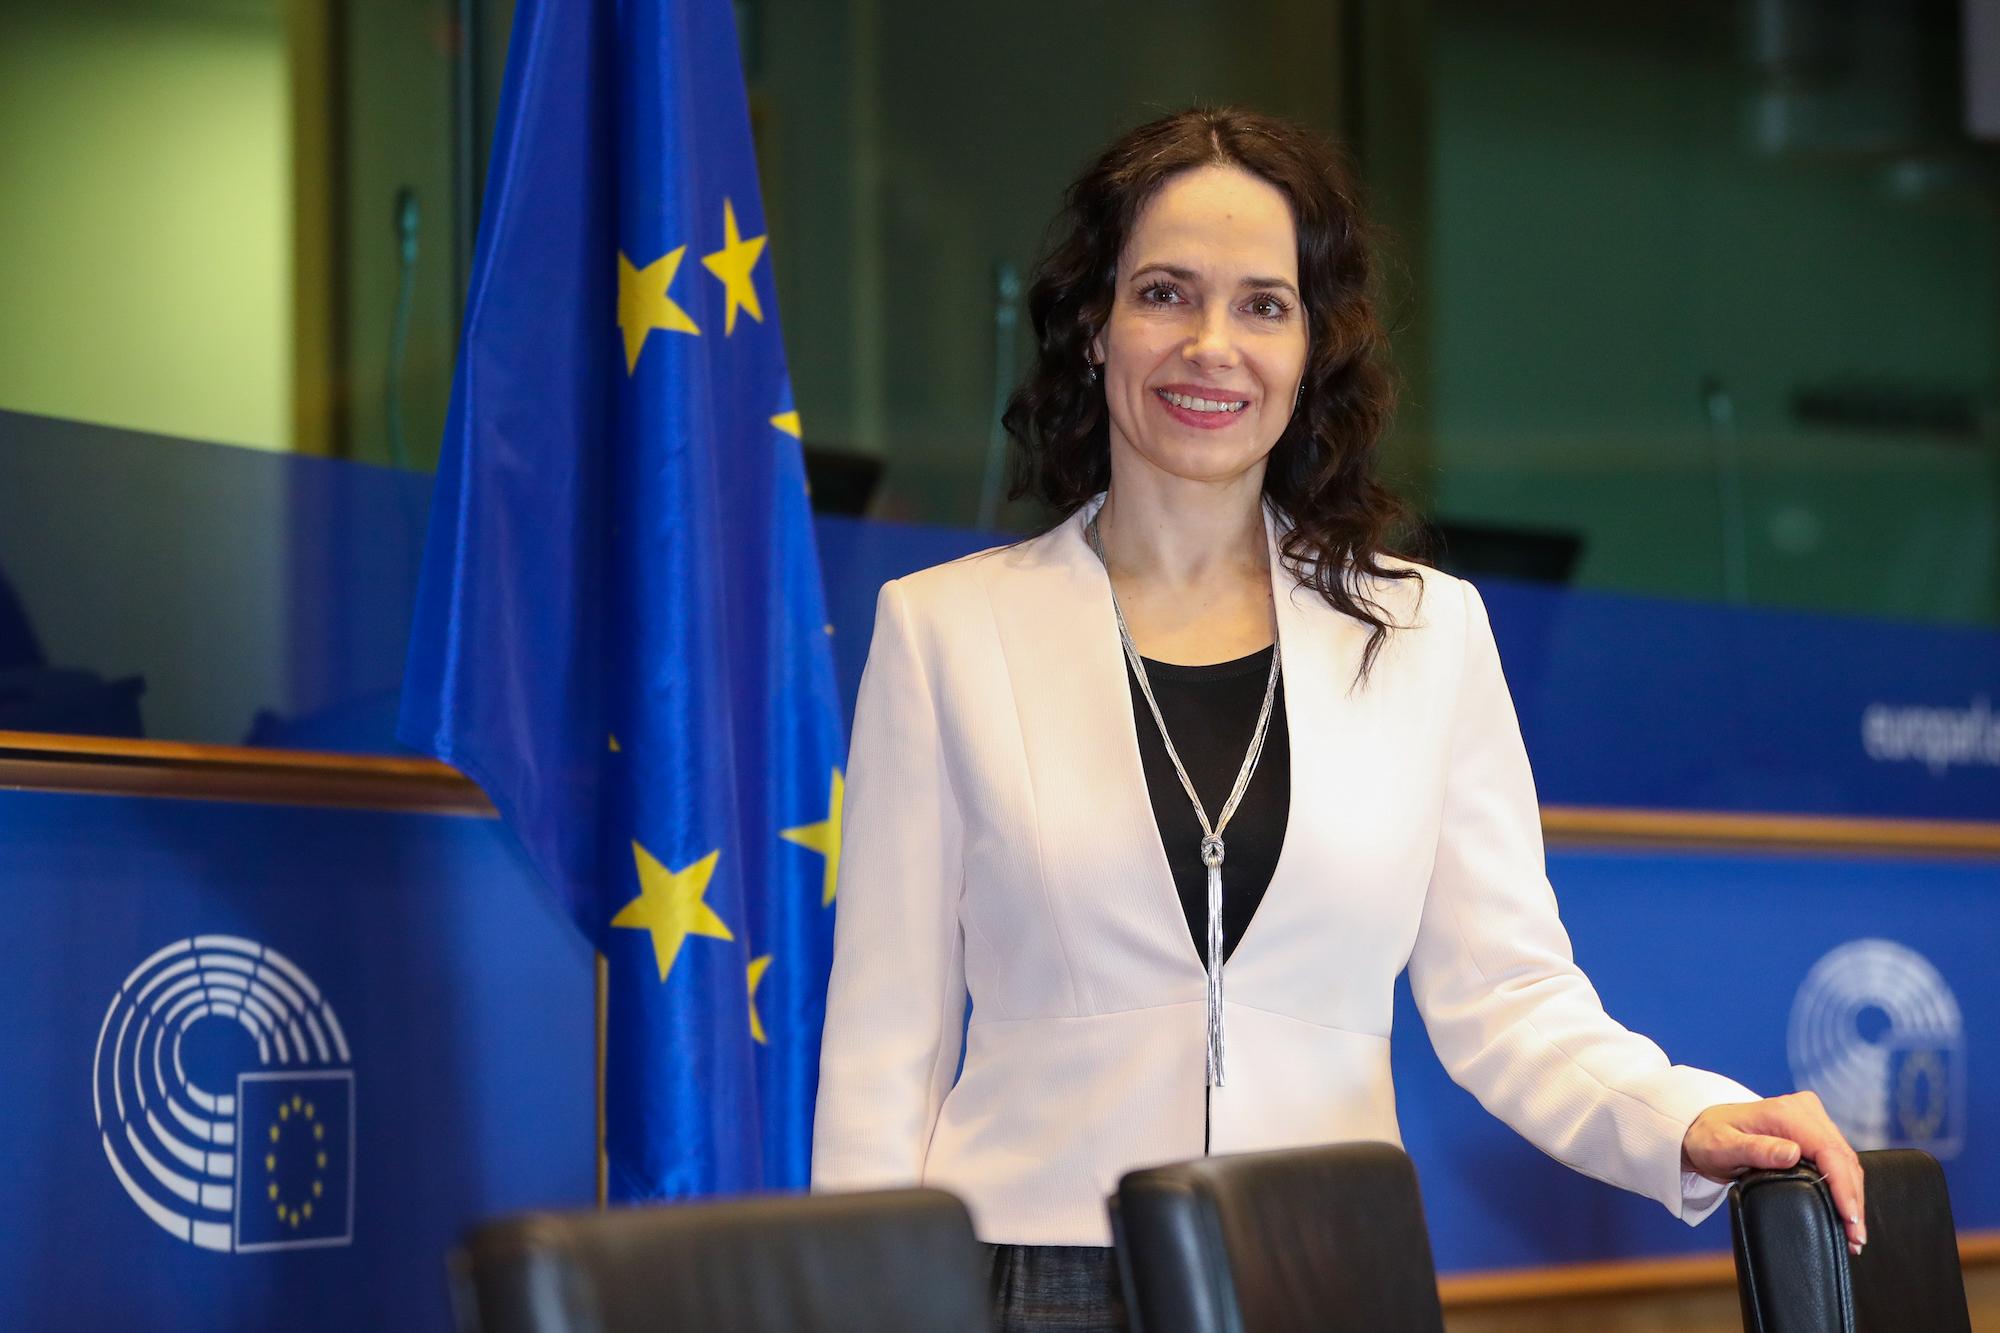 Miriam Lexmann, europoslankyňa (KDH), Foto: Európsky parlament